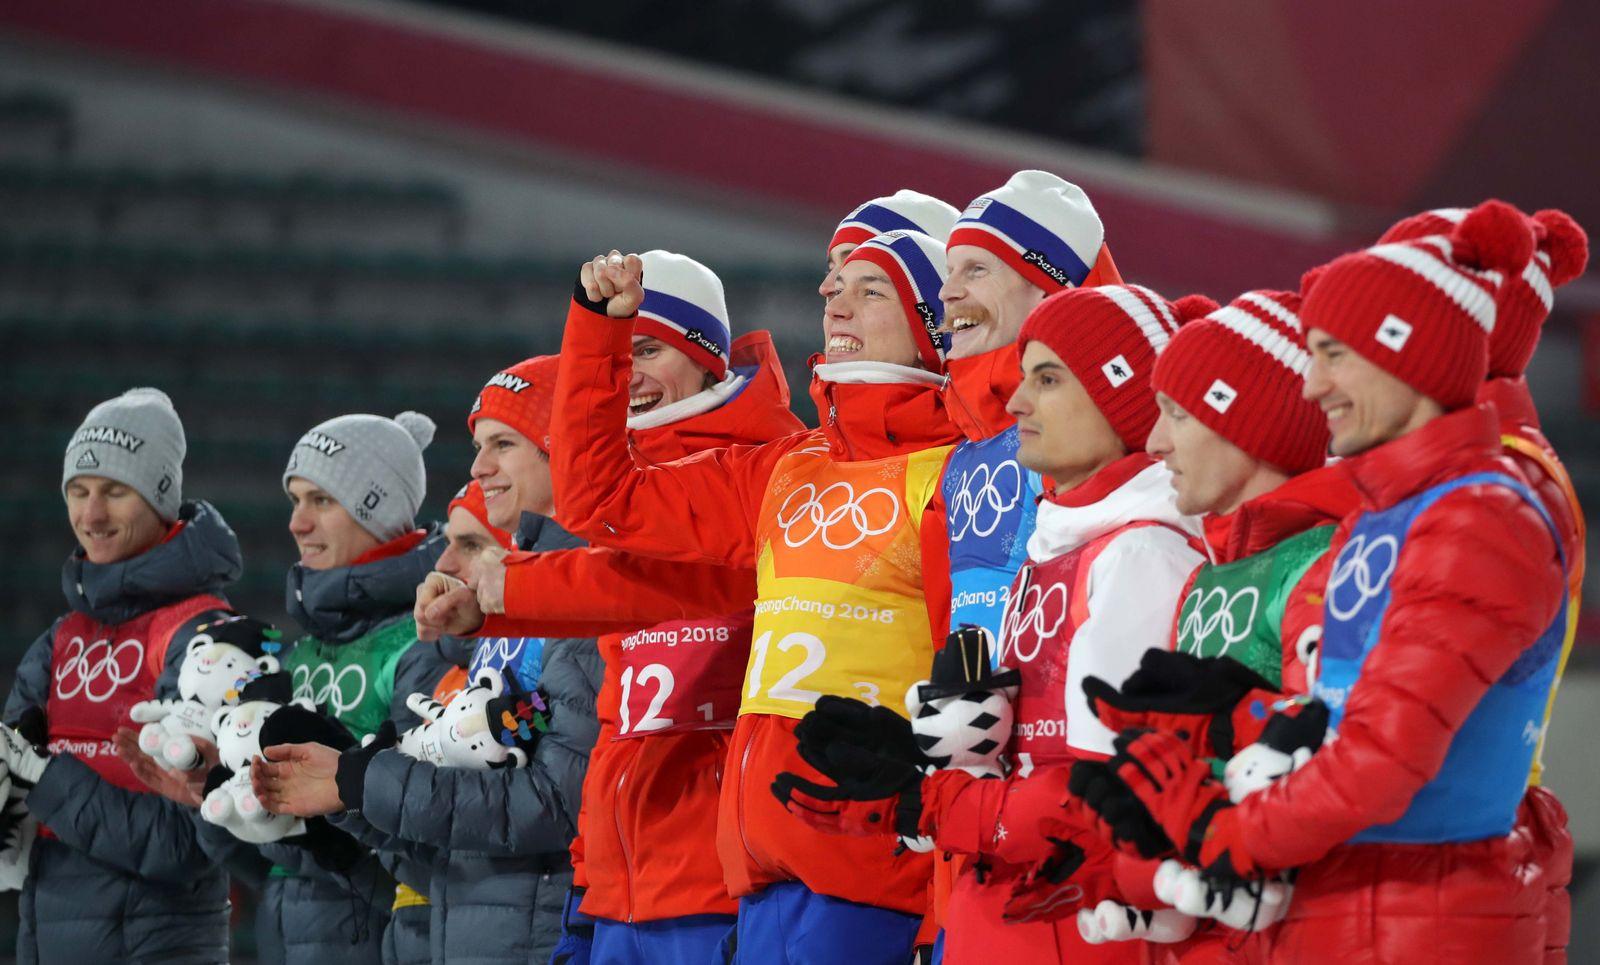 OLYMPICS-2018-SKIJ-M-TEAM/